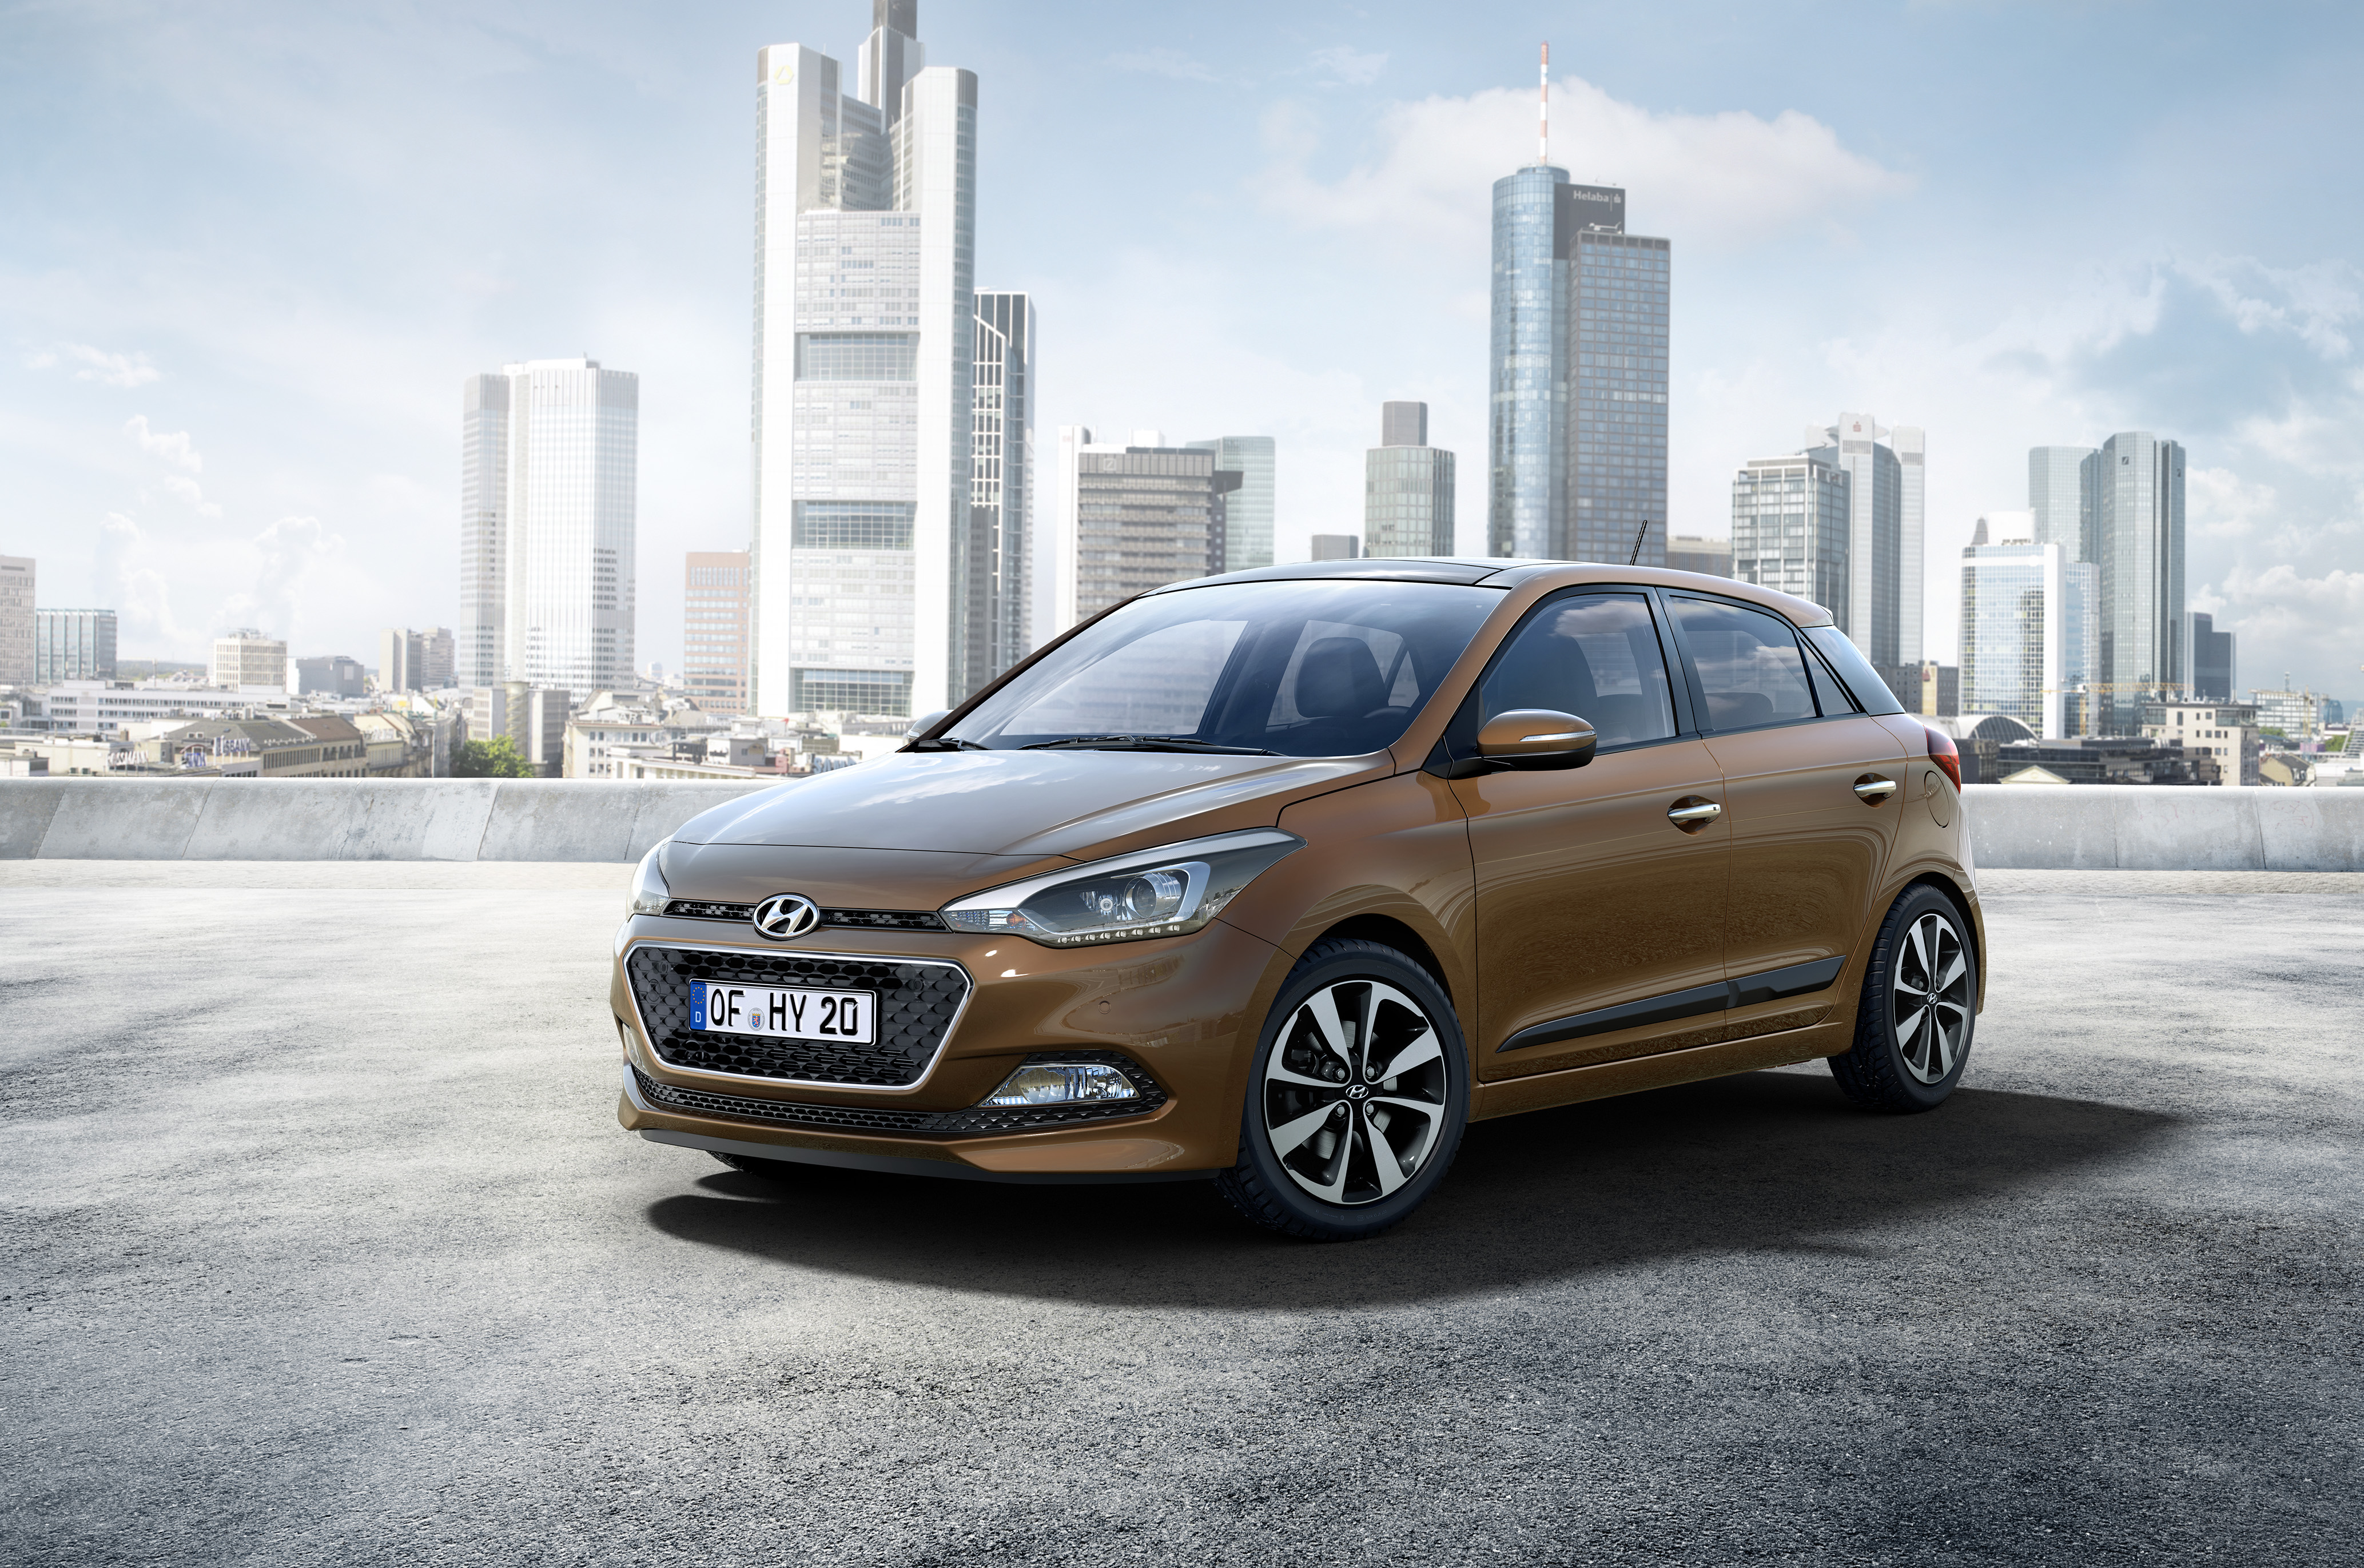 Hyundai Motor unveils New Generation i20 ahead of Paris Motor Show debut